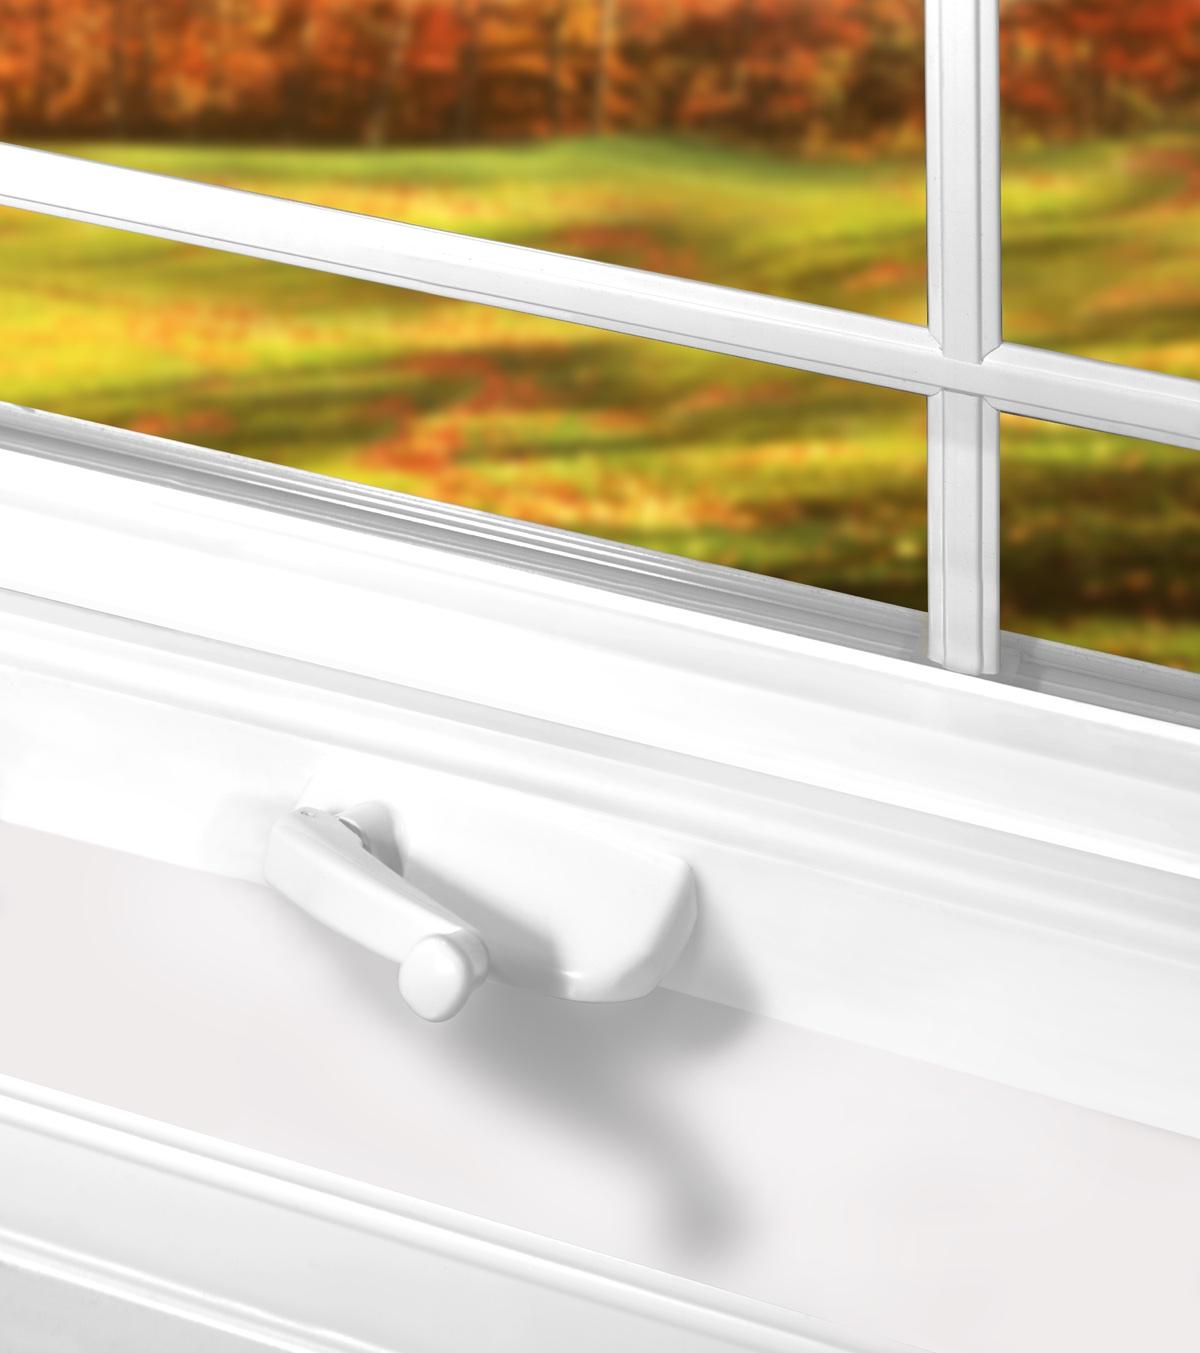 One Style of Casement Window Crank Handle